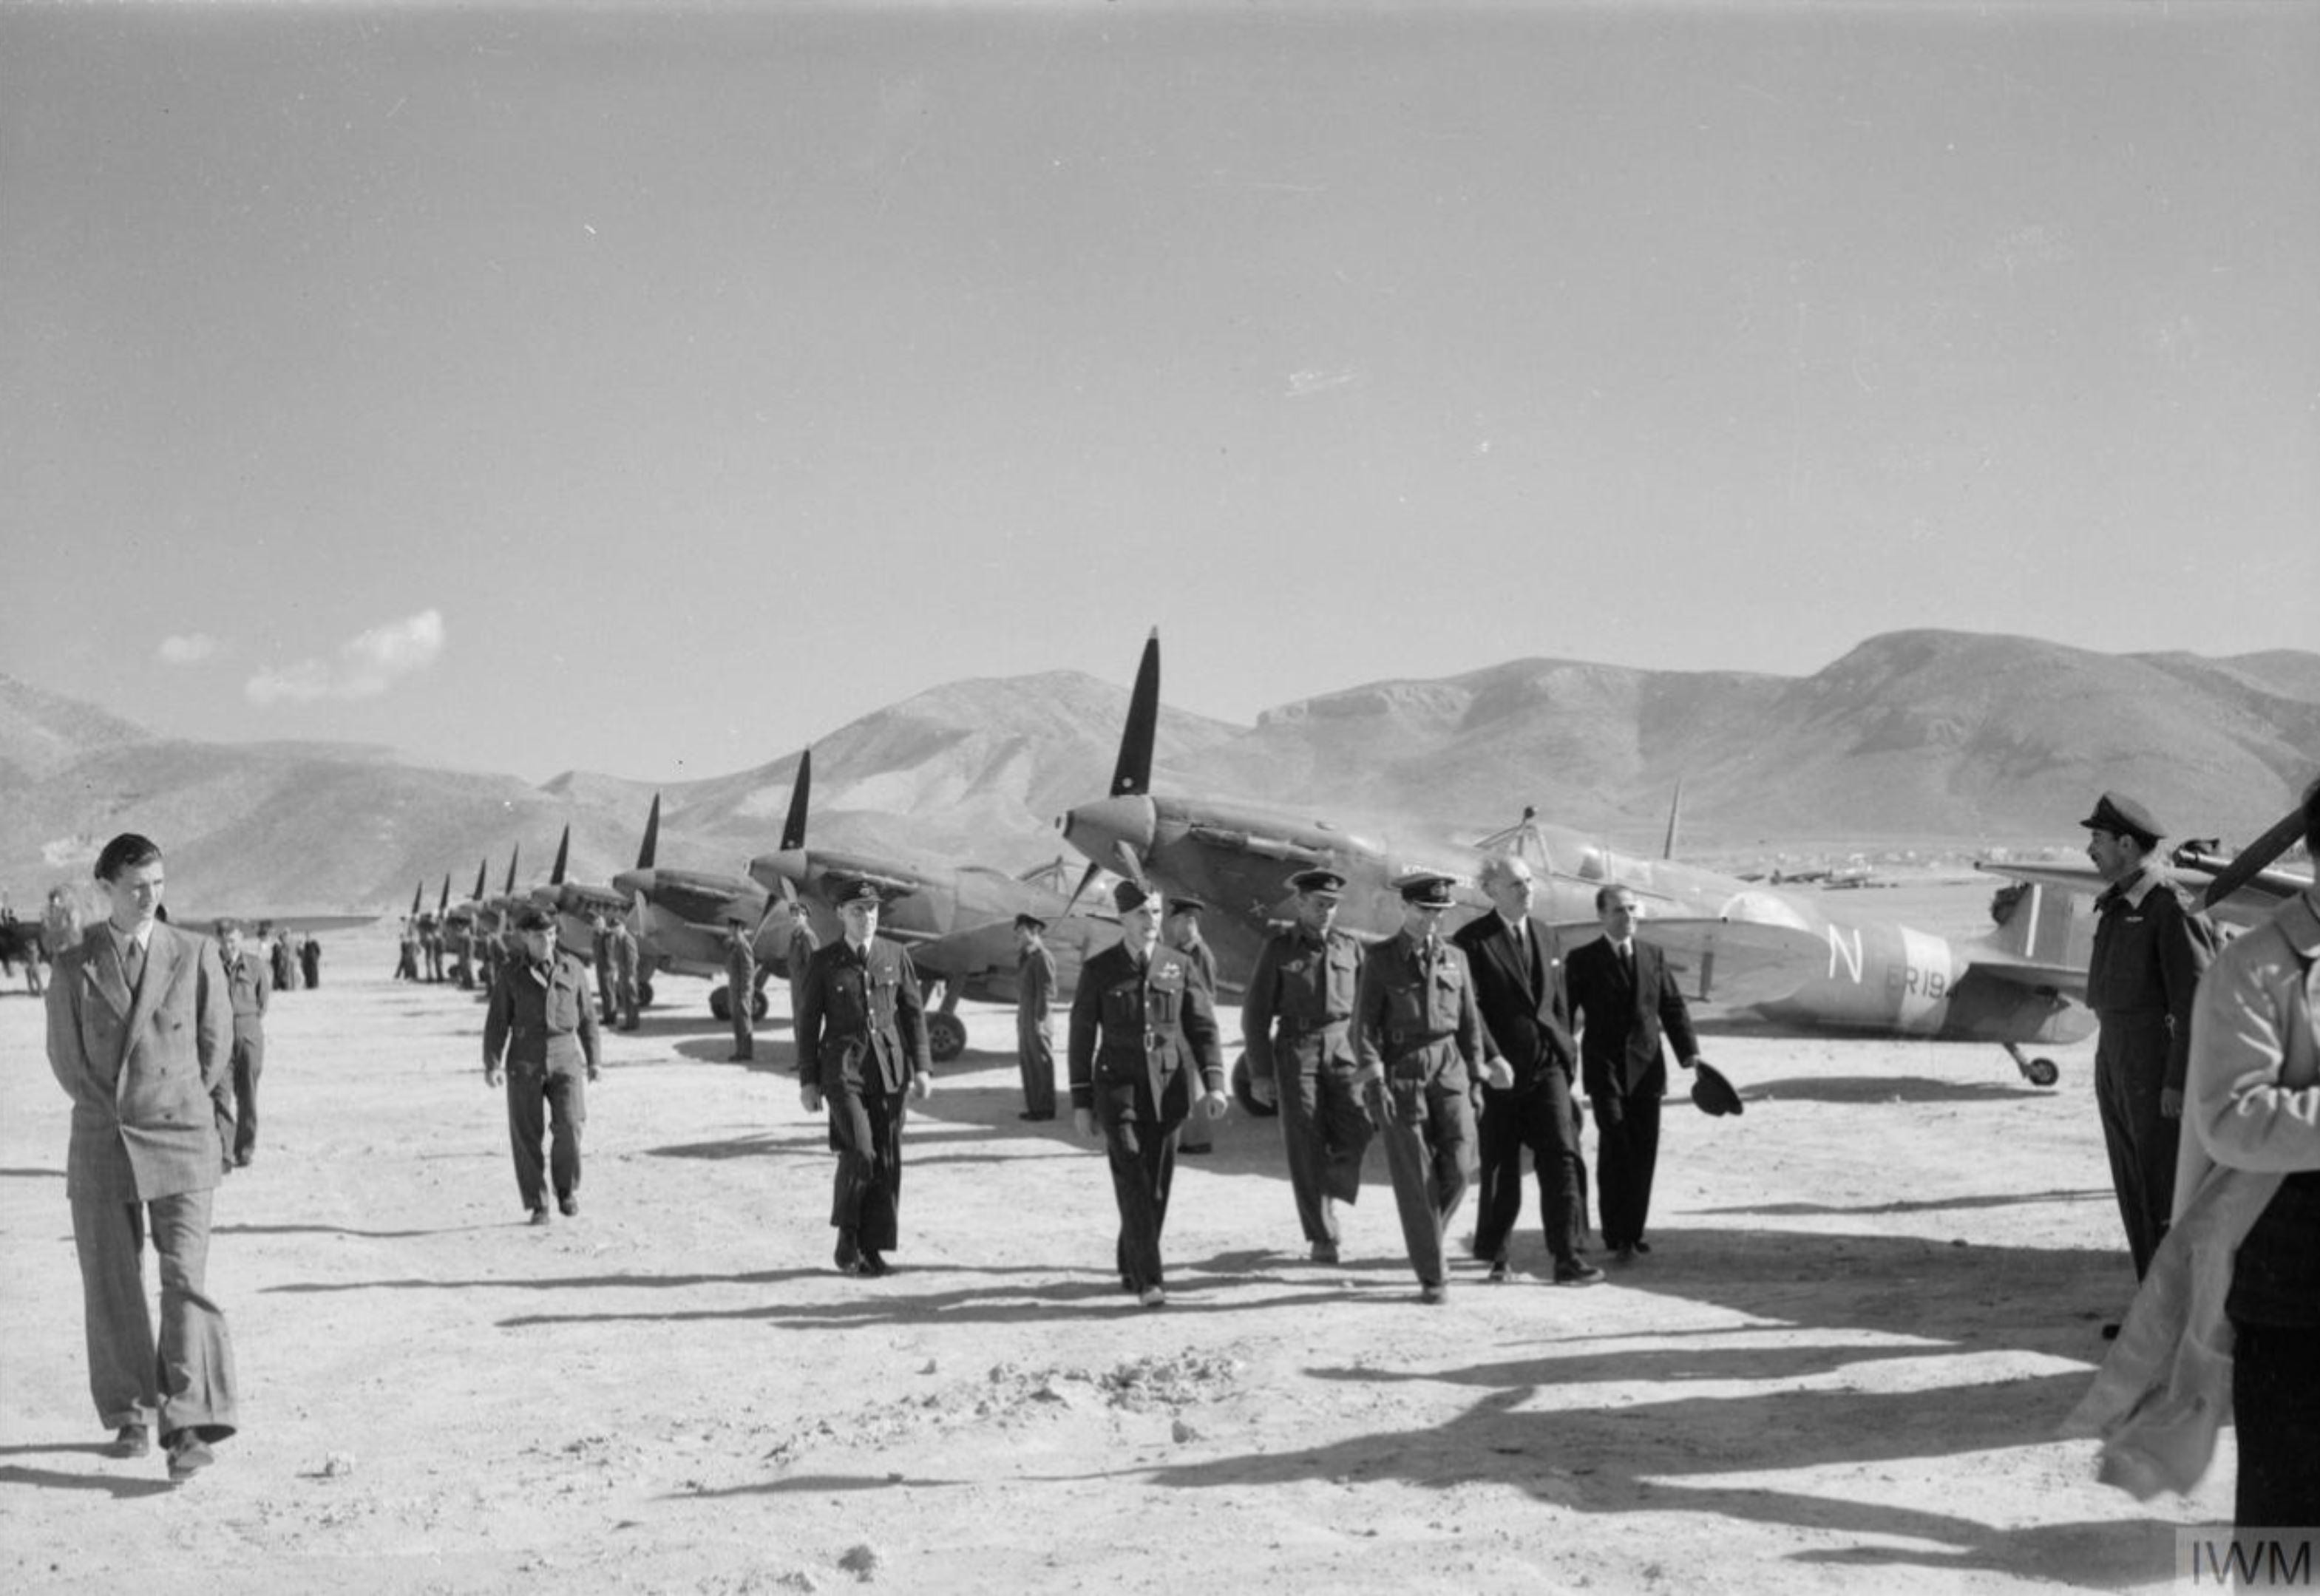 Spitfire MkVc RAF 336Sqn N ER194 at Kalamaki Greece IWM CNA4686